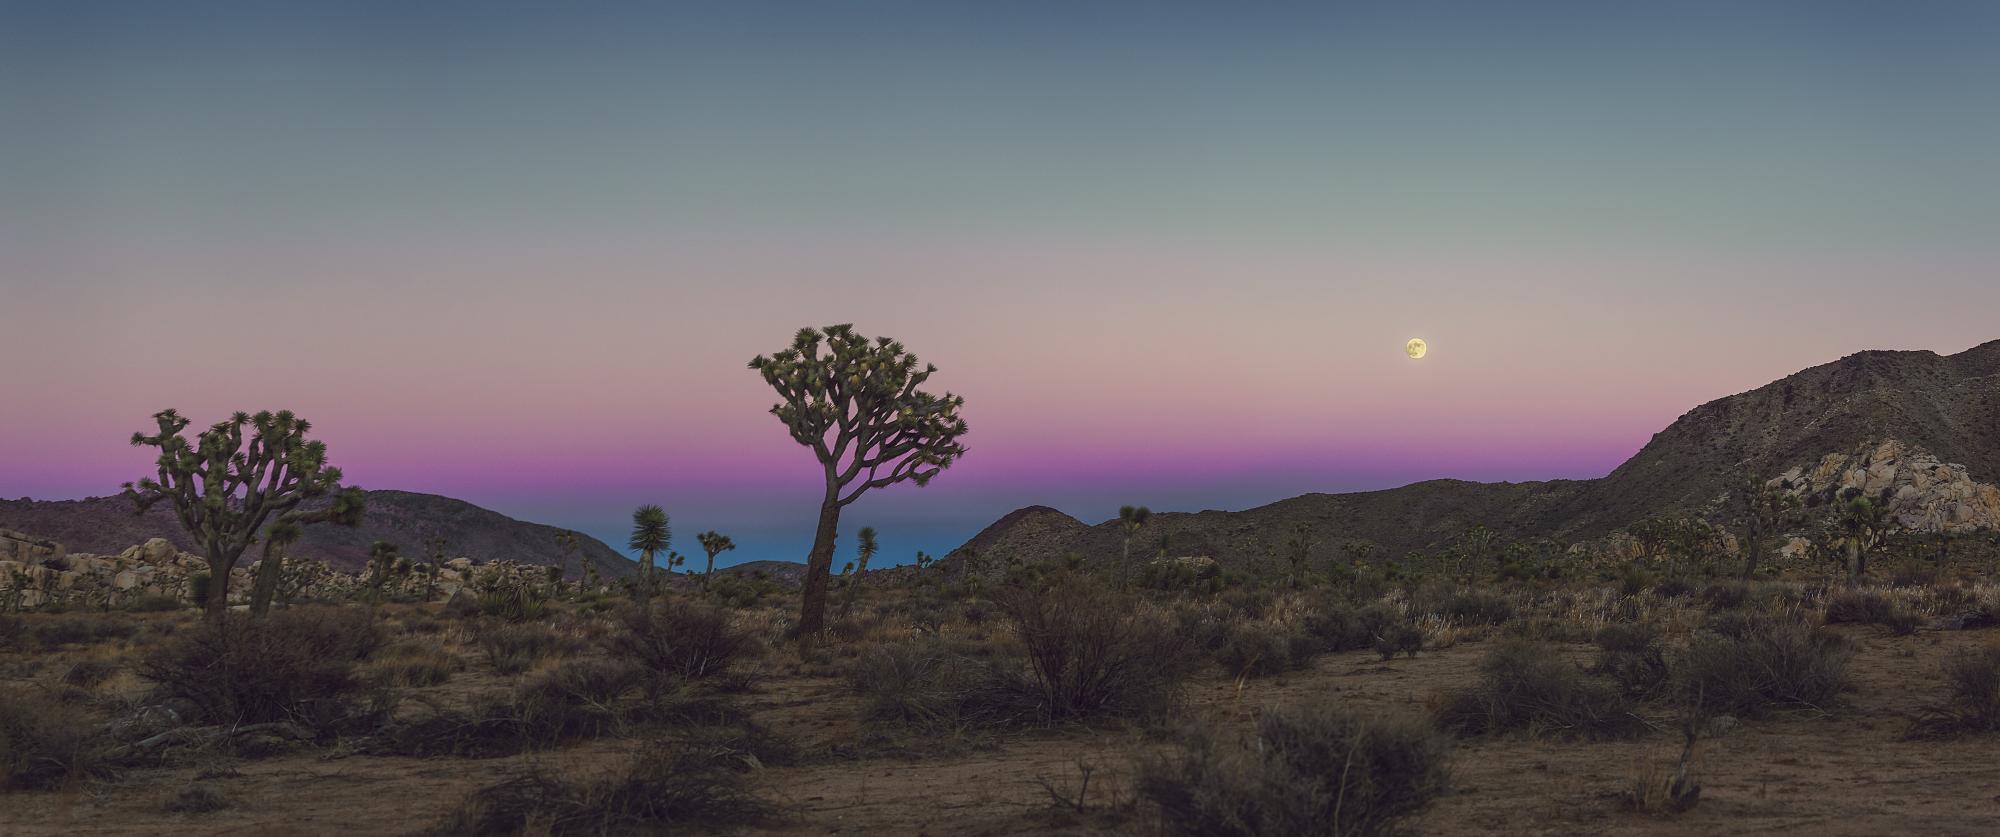 Umbra Moonrise Over Joshua Tree